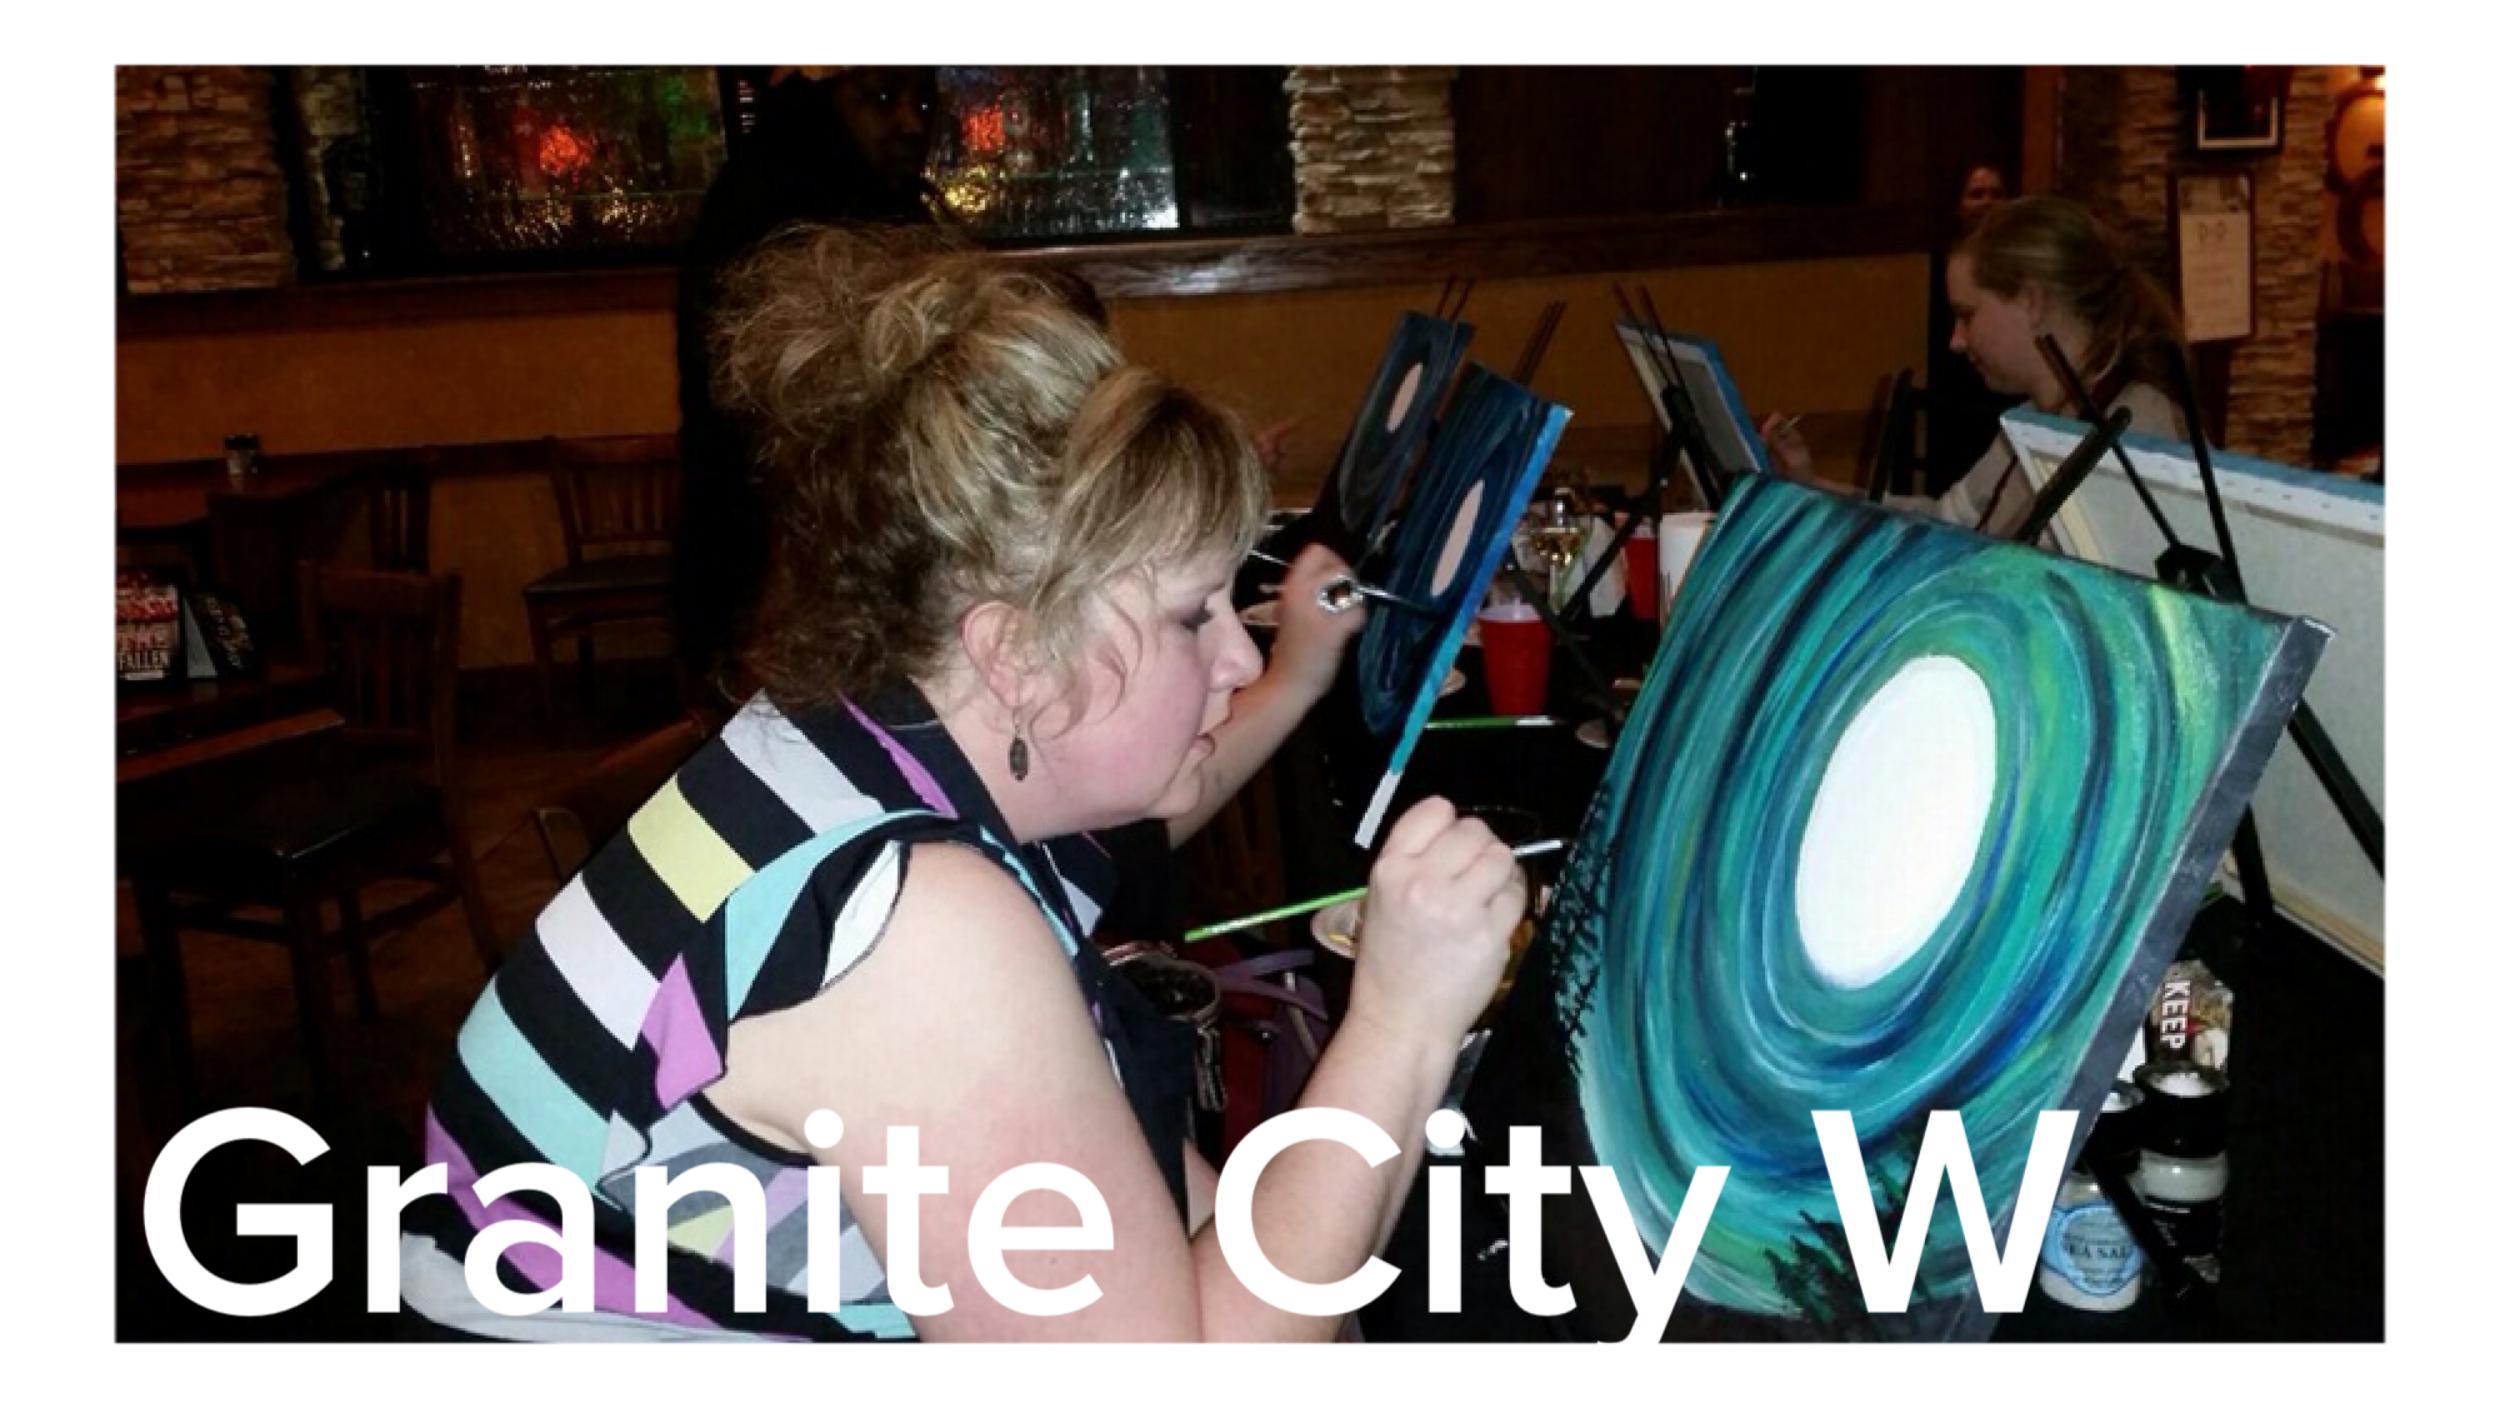 Granite City West Wichita, KS